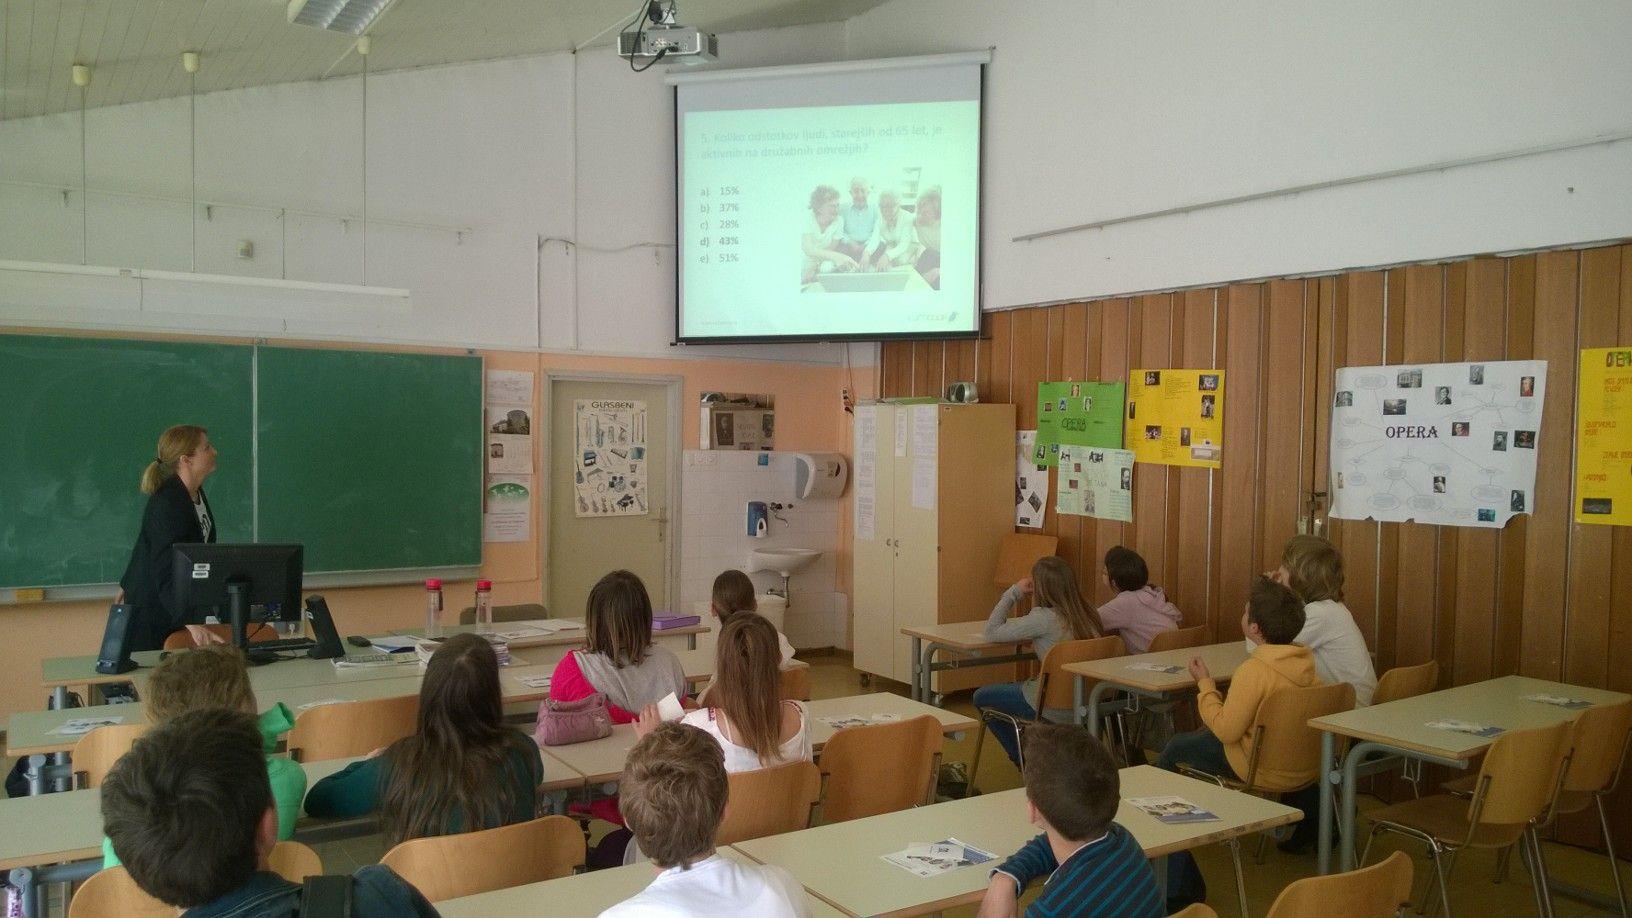 #education #quiz #social network #ior #slovenia